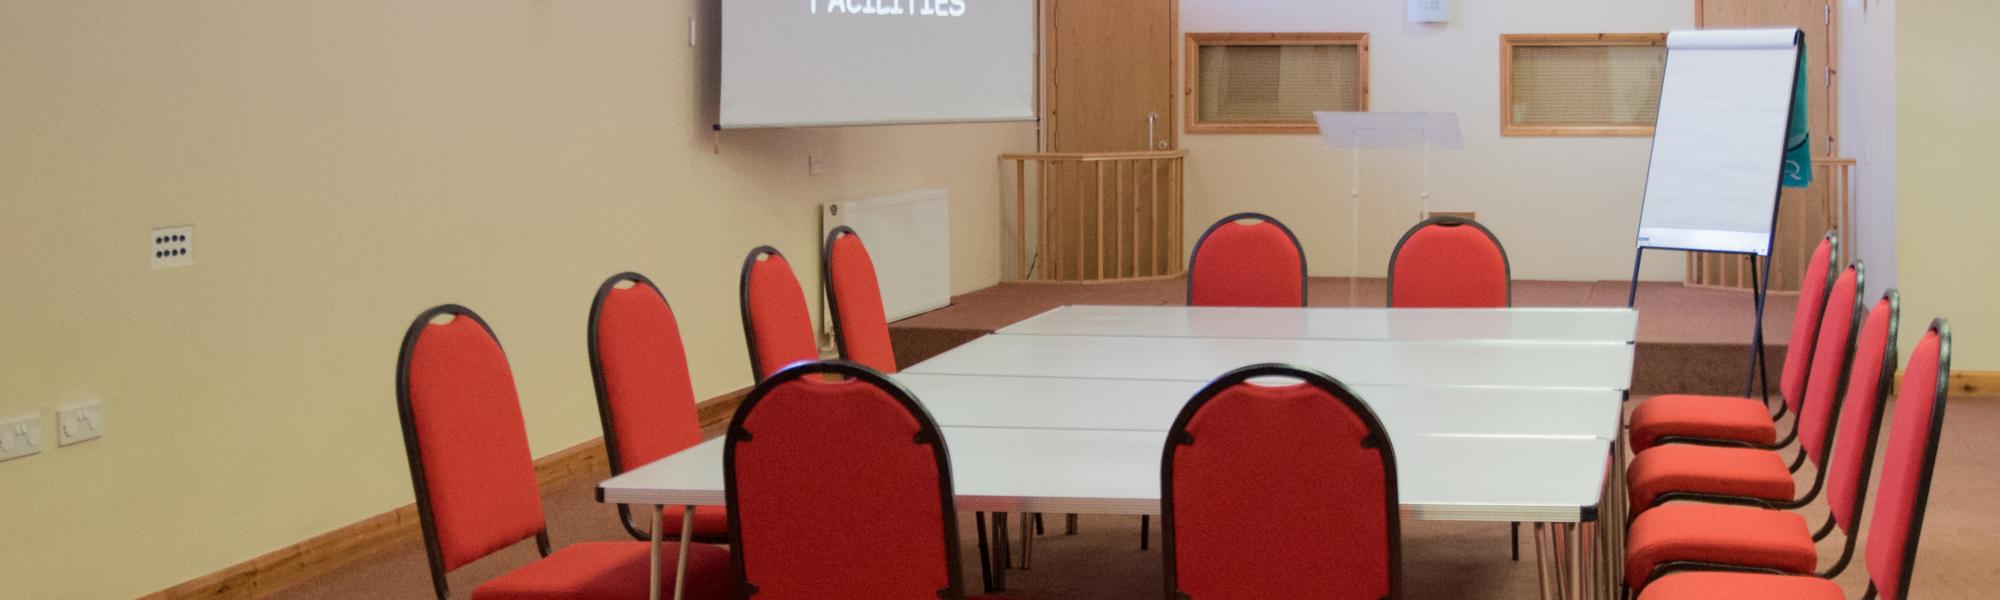 GNC MH boardroom 2